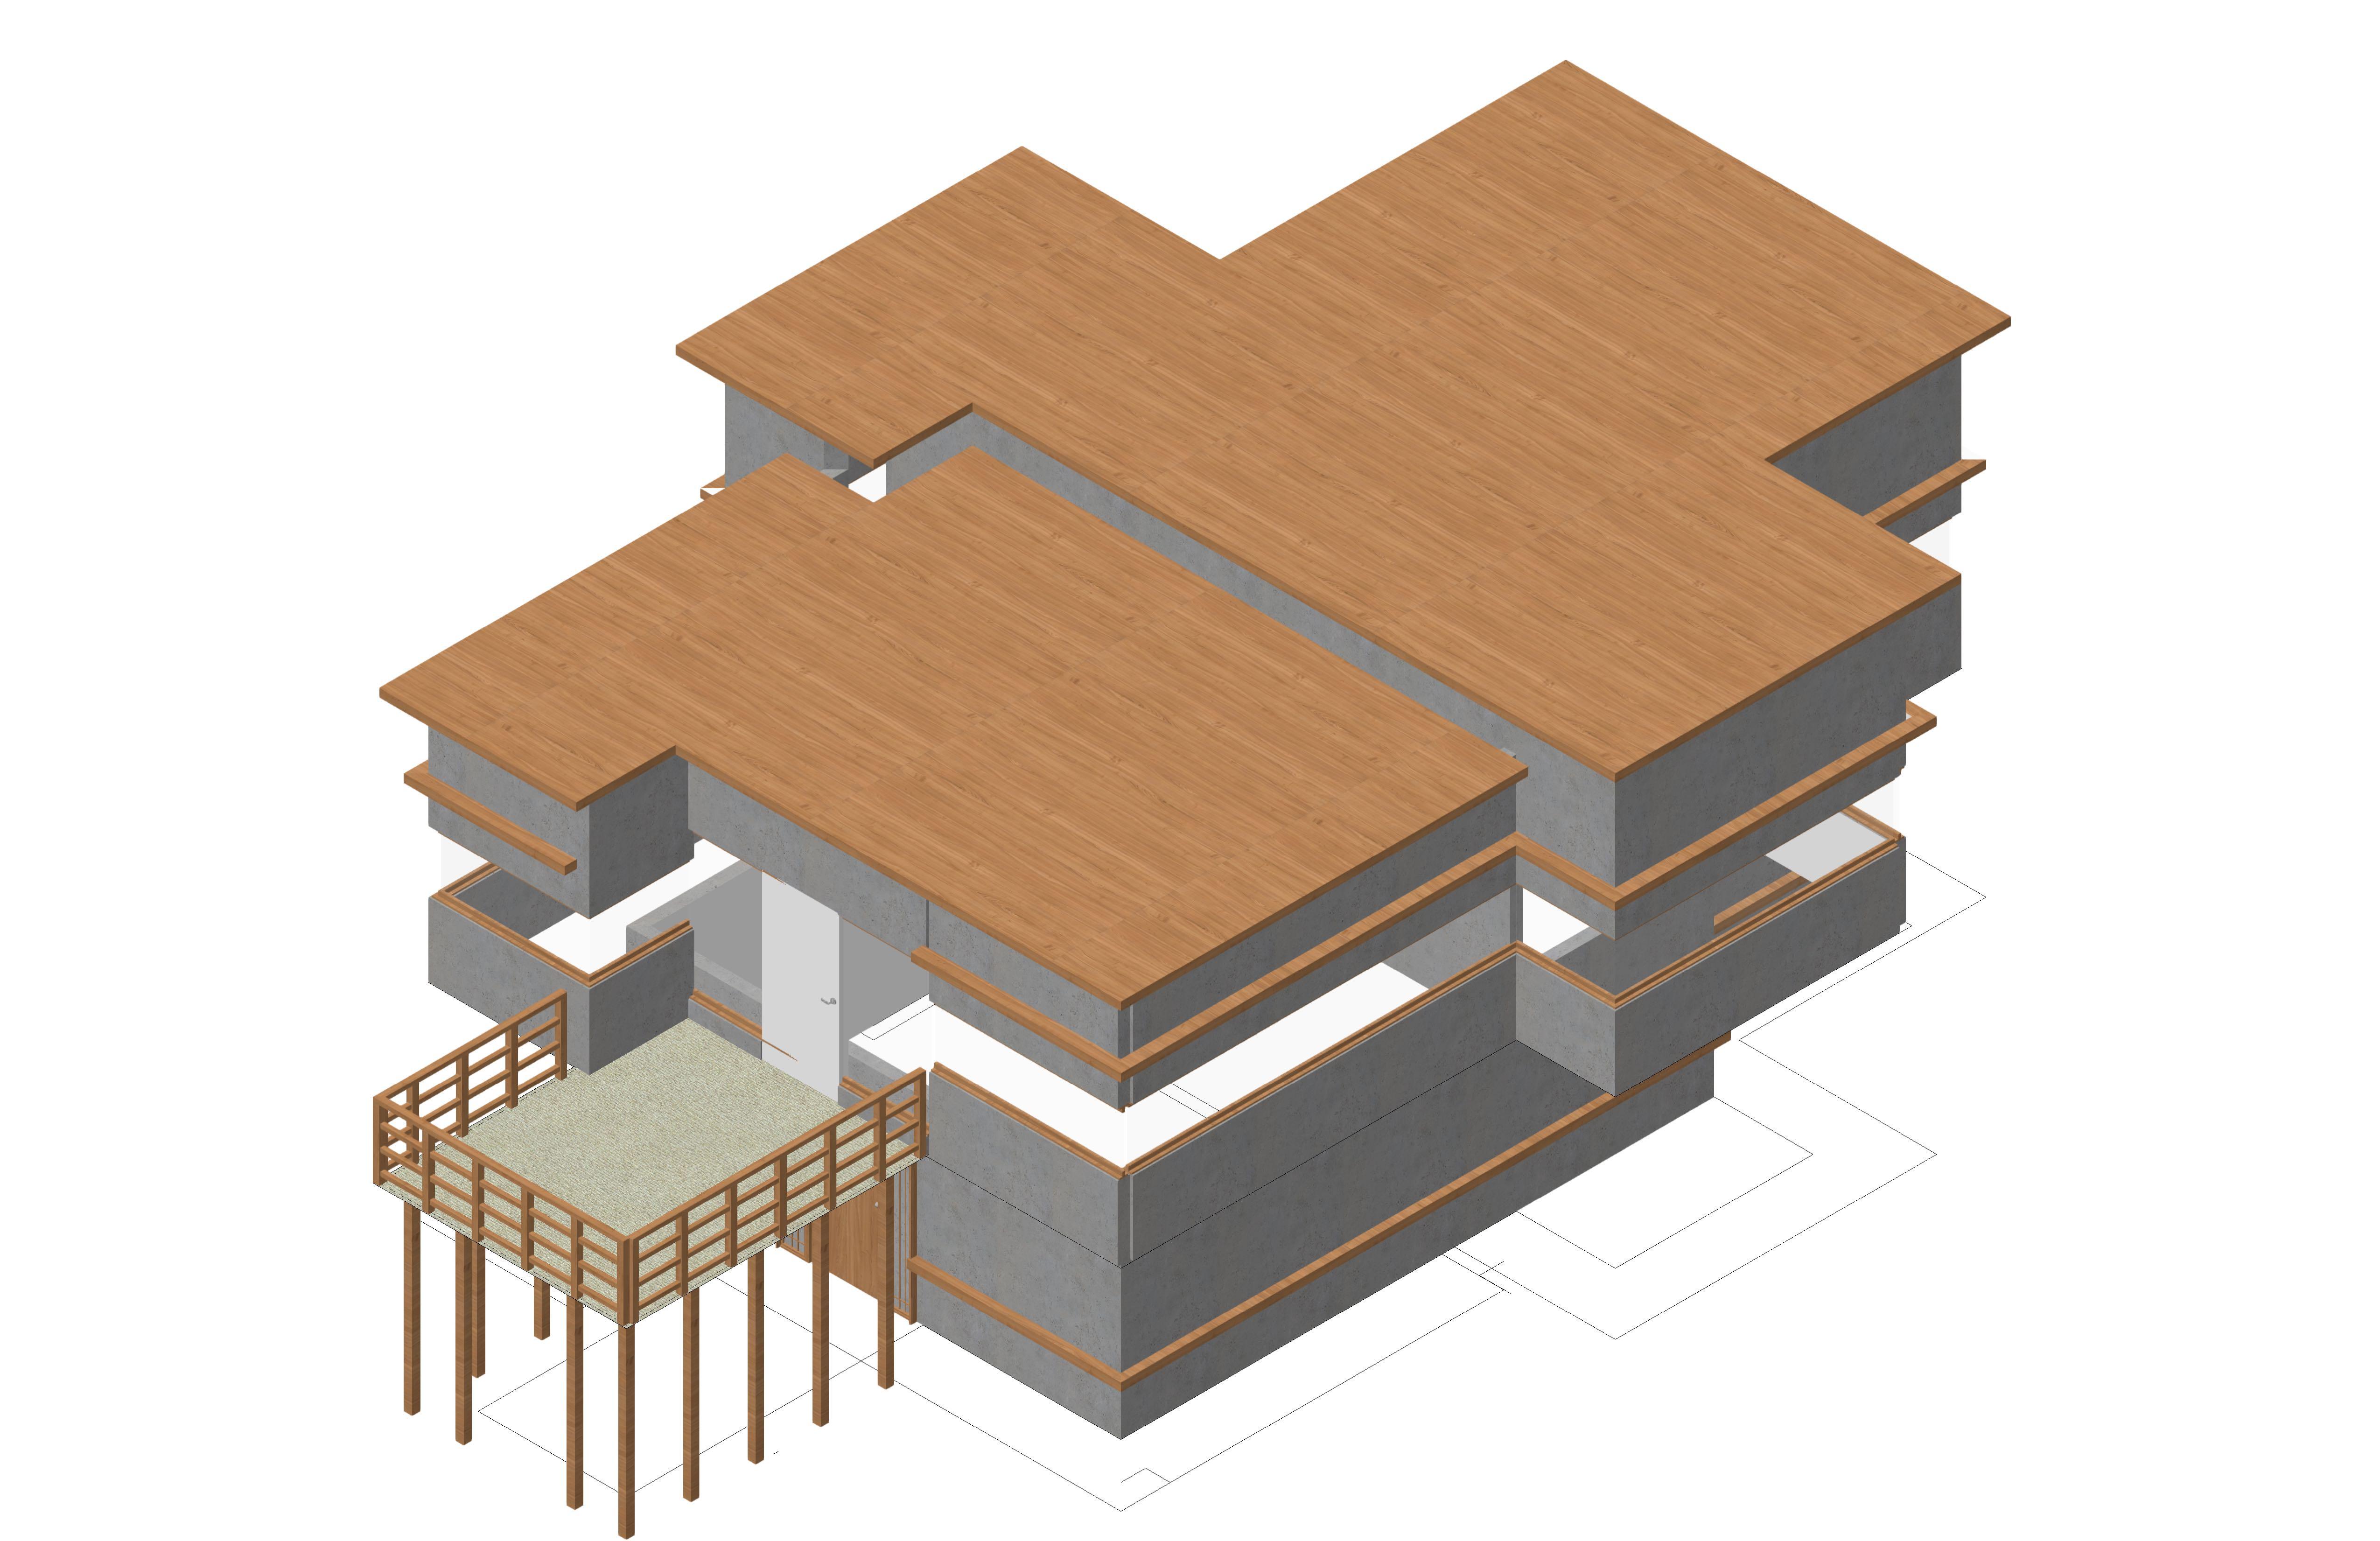 Nick's Architecture Model